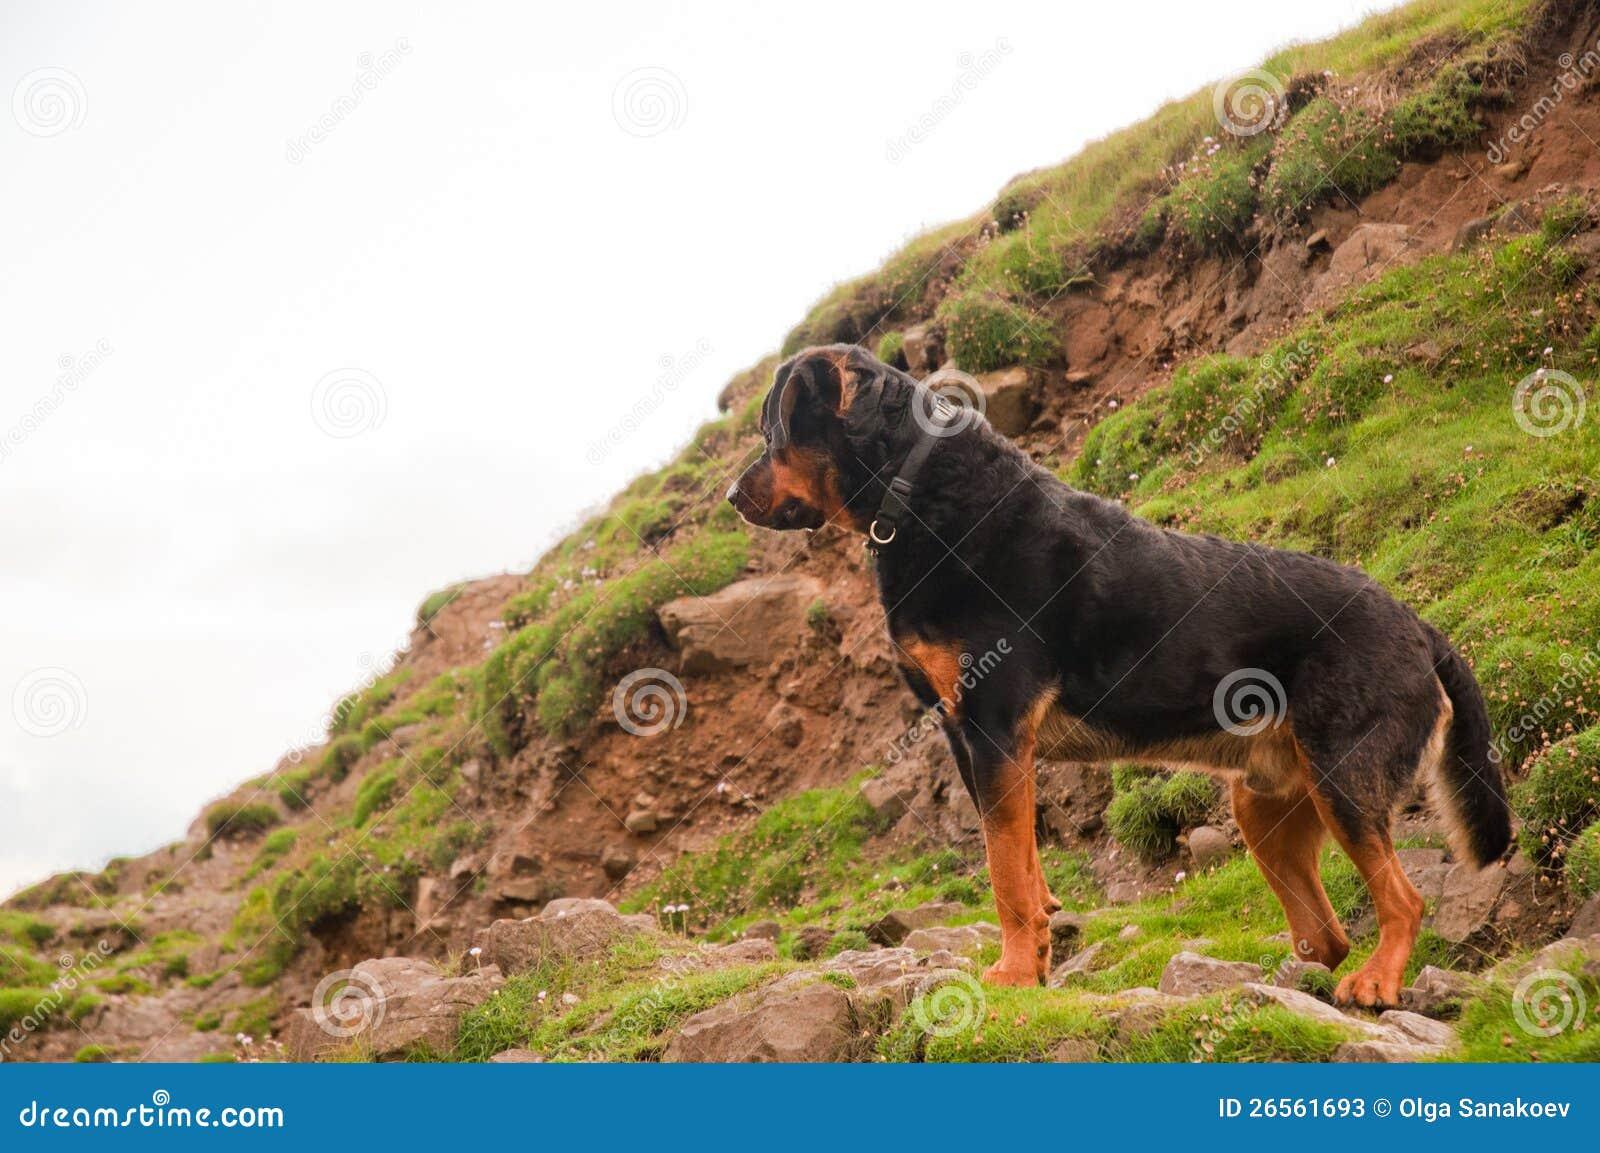 A Rottweiler Dog Calmly Standing On A Hill Stock Photos ...